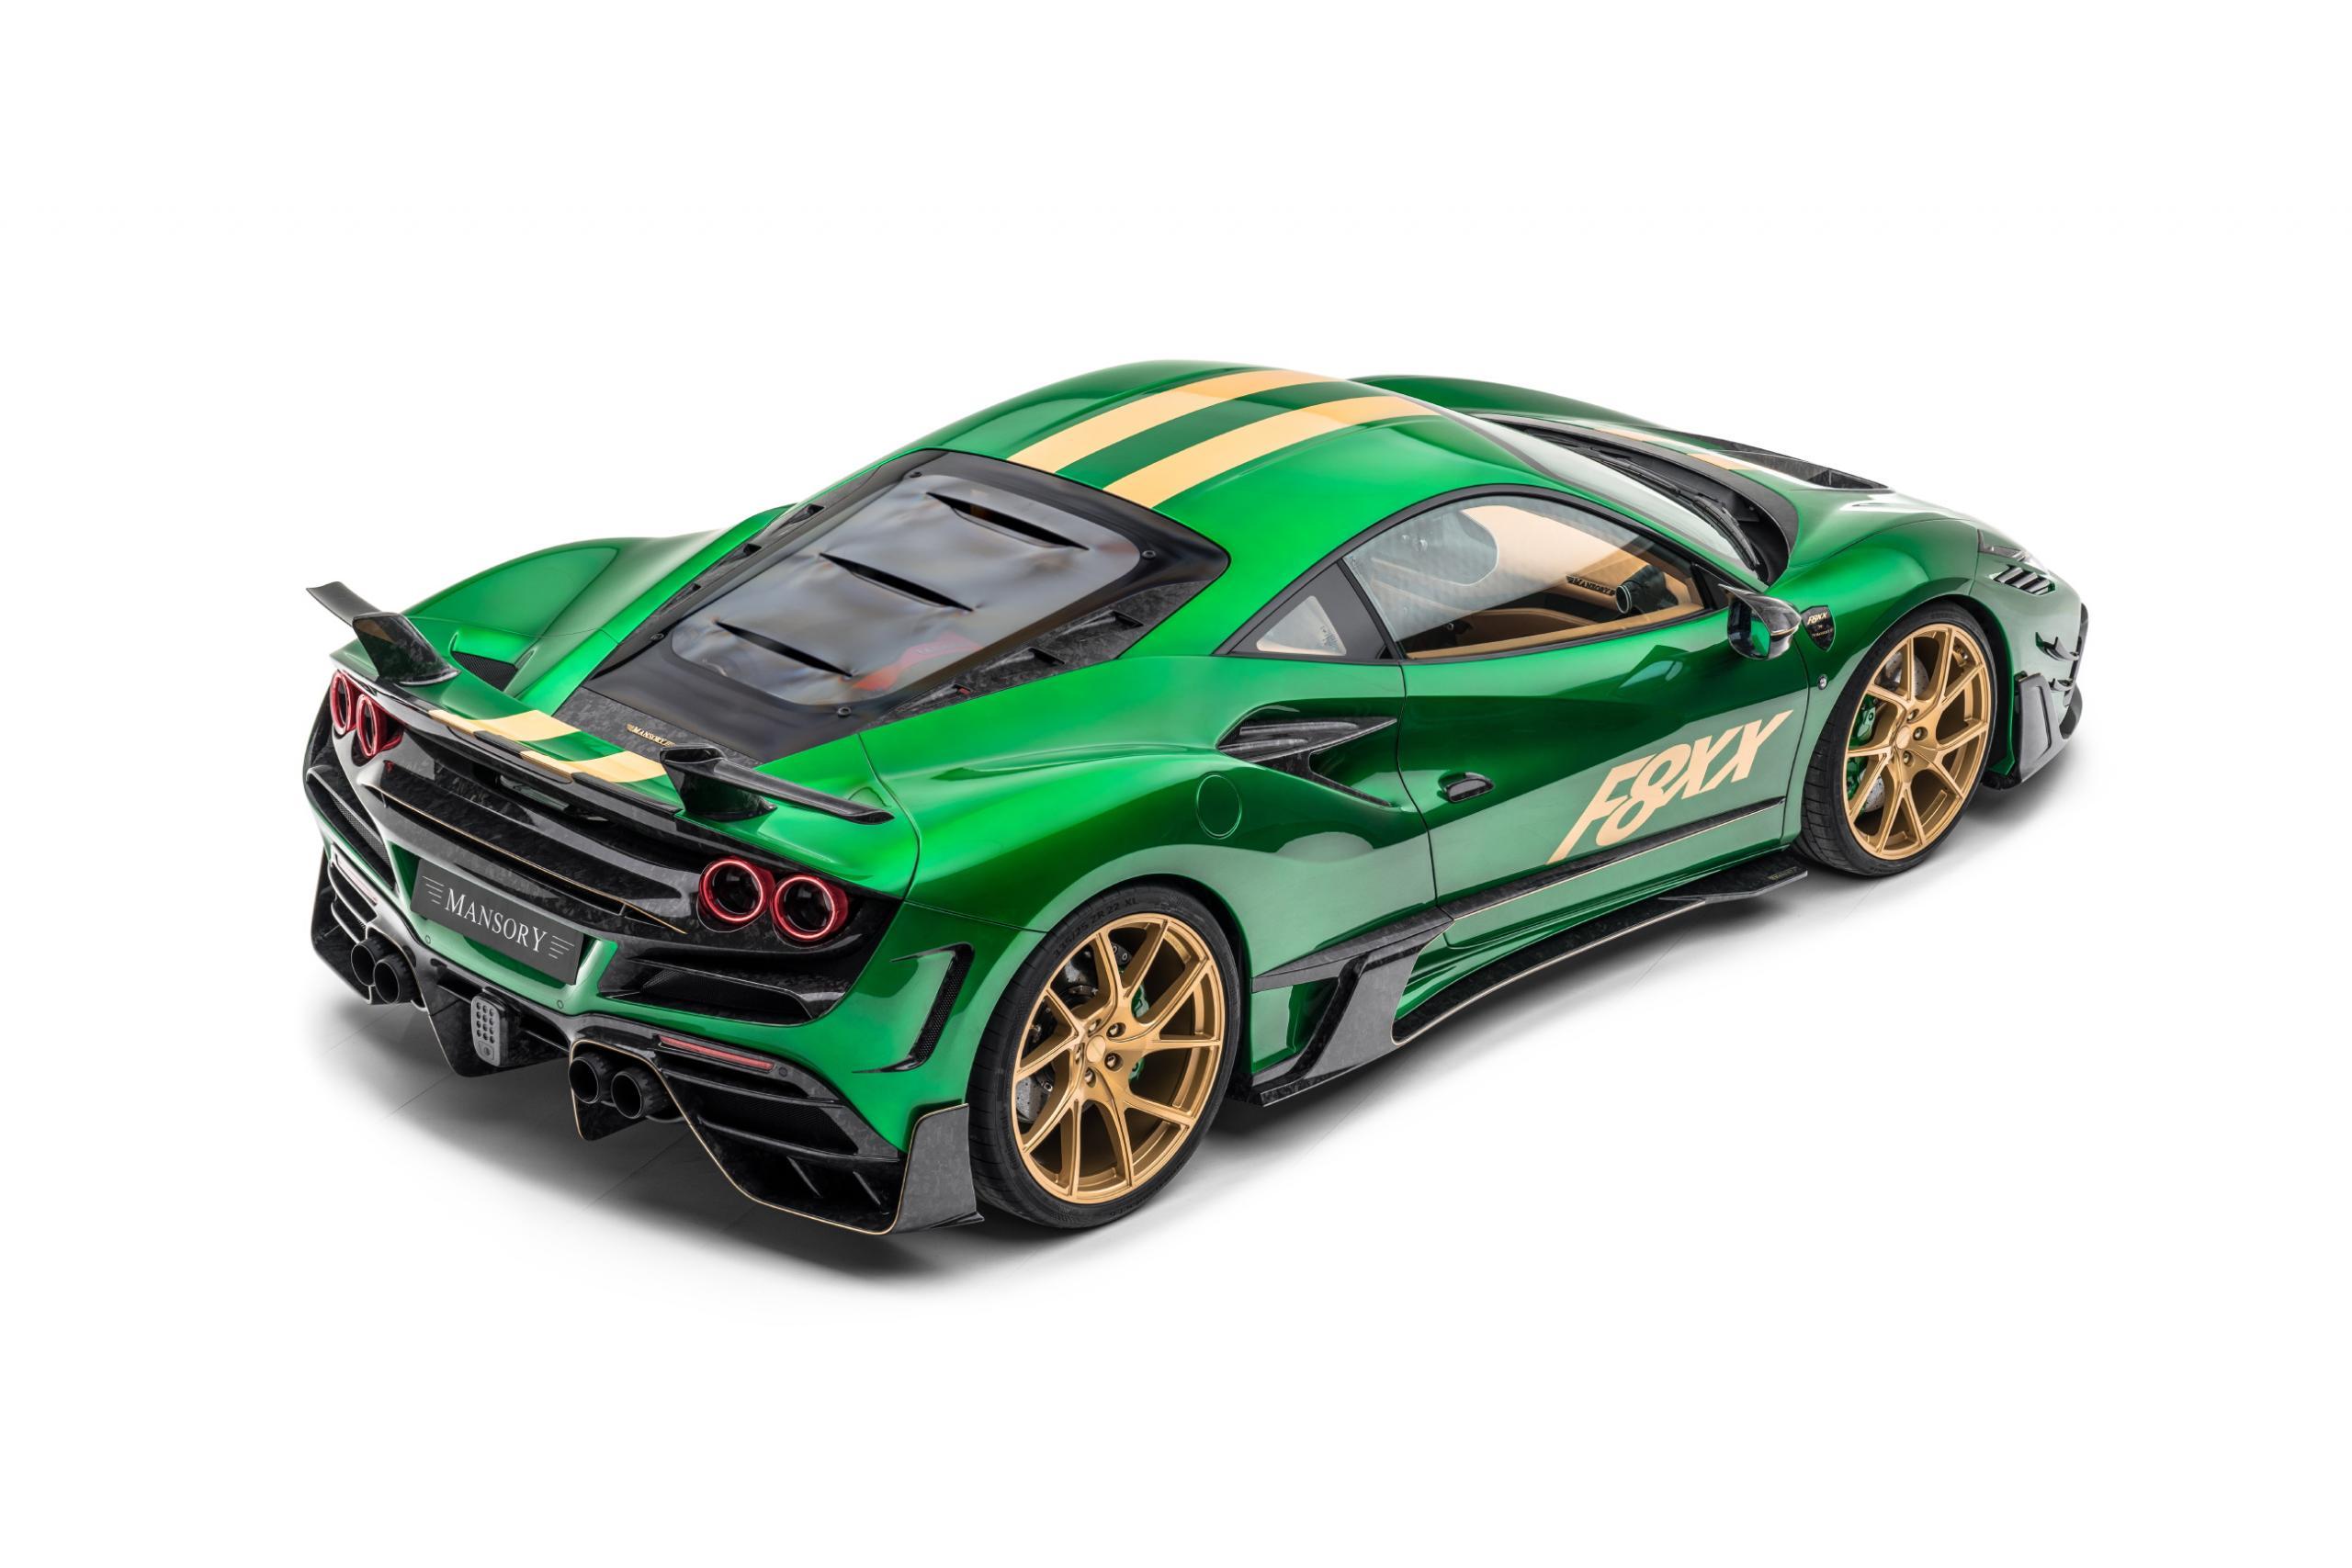 mansory f8xx ferrari f8 body kit carbon fiber rear bumper rear spoiler y.5 forged wheel 2020 2021 rear top angle